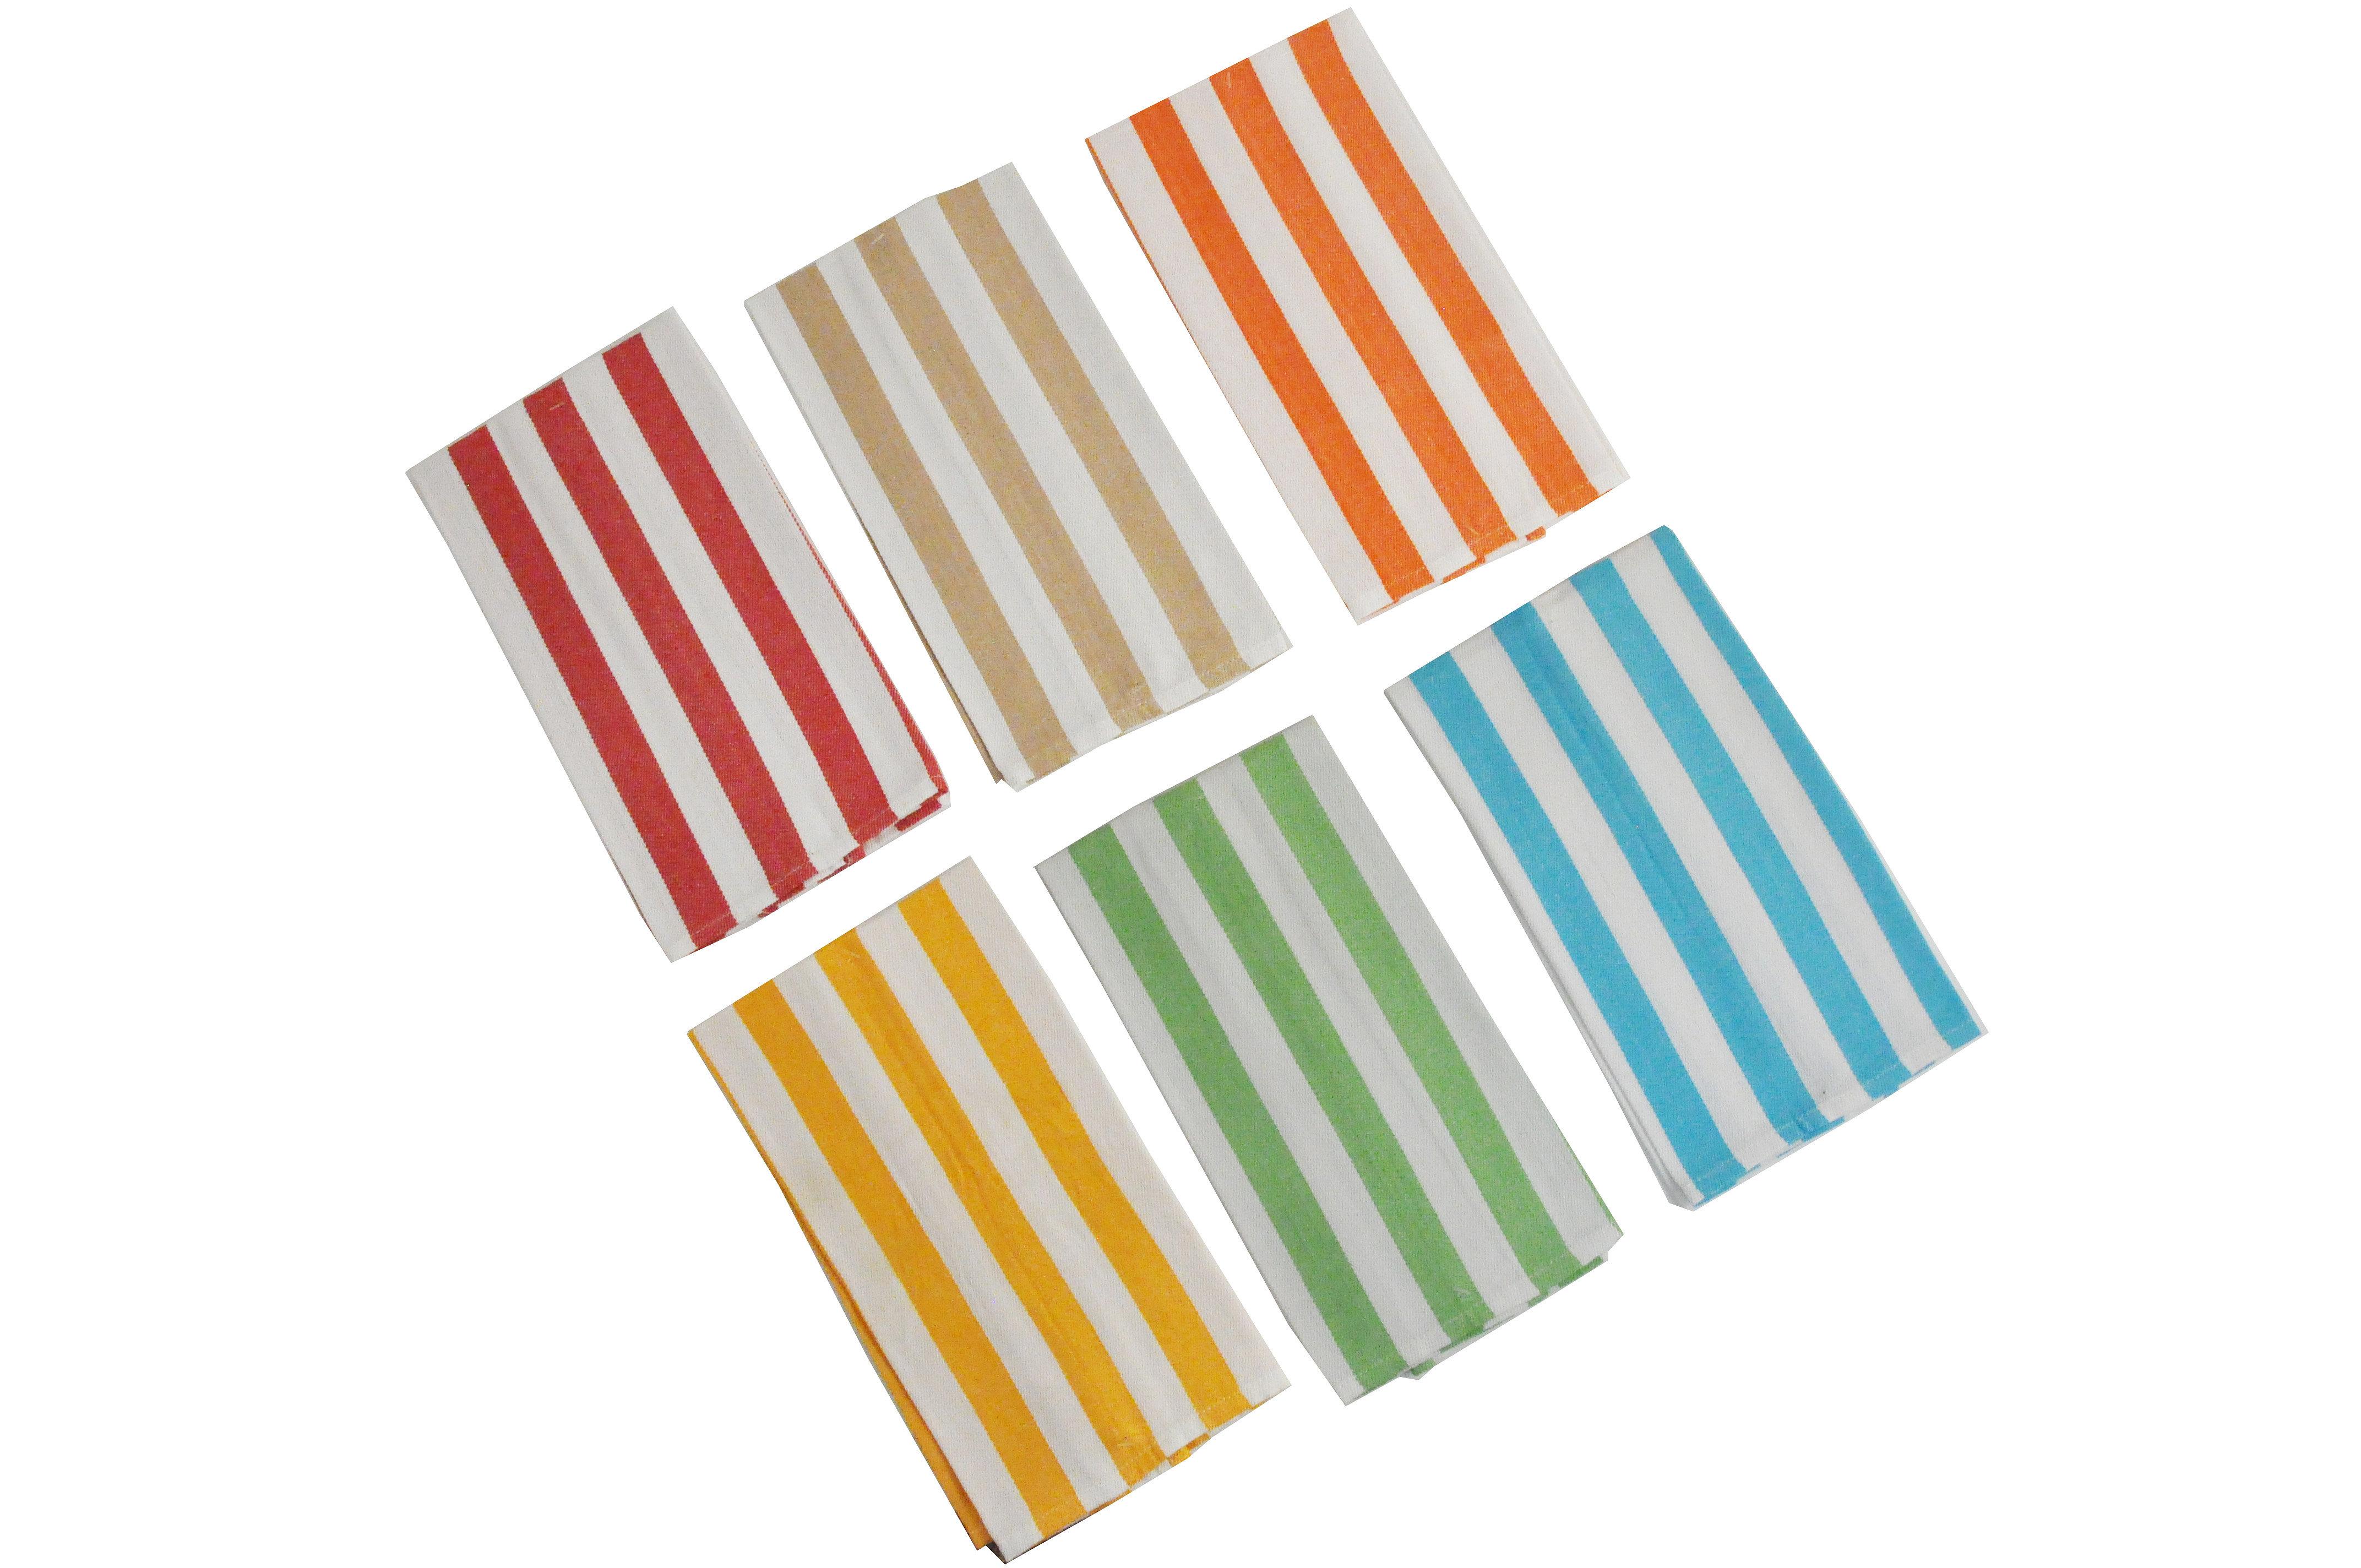 cheap kitchen towels kidkraft deluxe big & bright 53100 harbor stripe towel 15x25 case pack 144 living